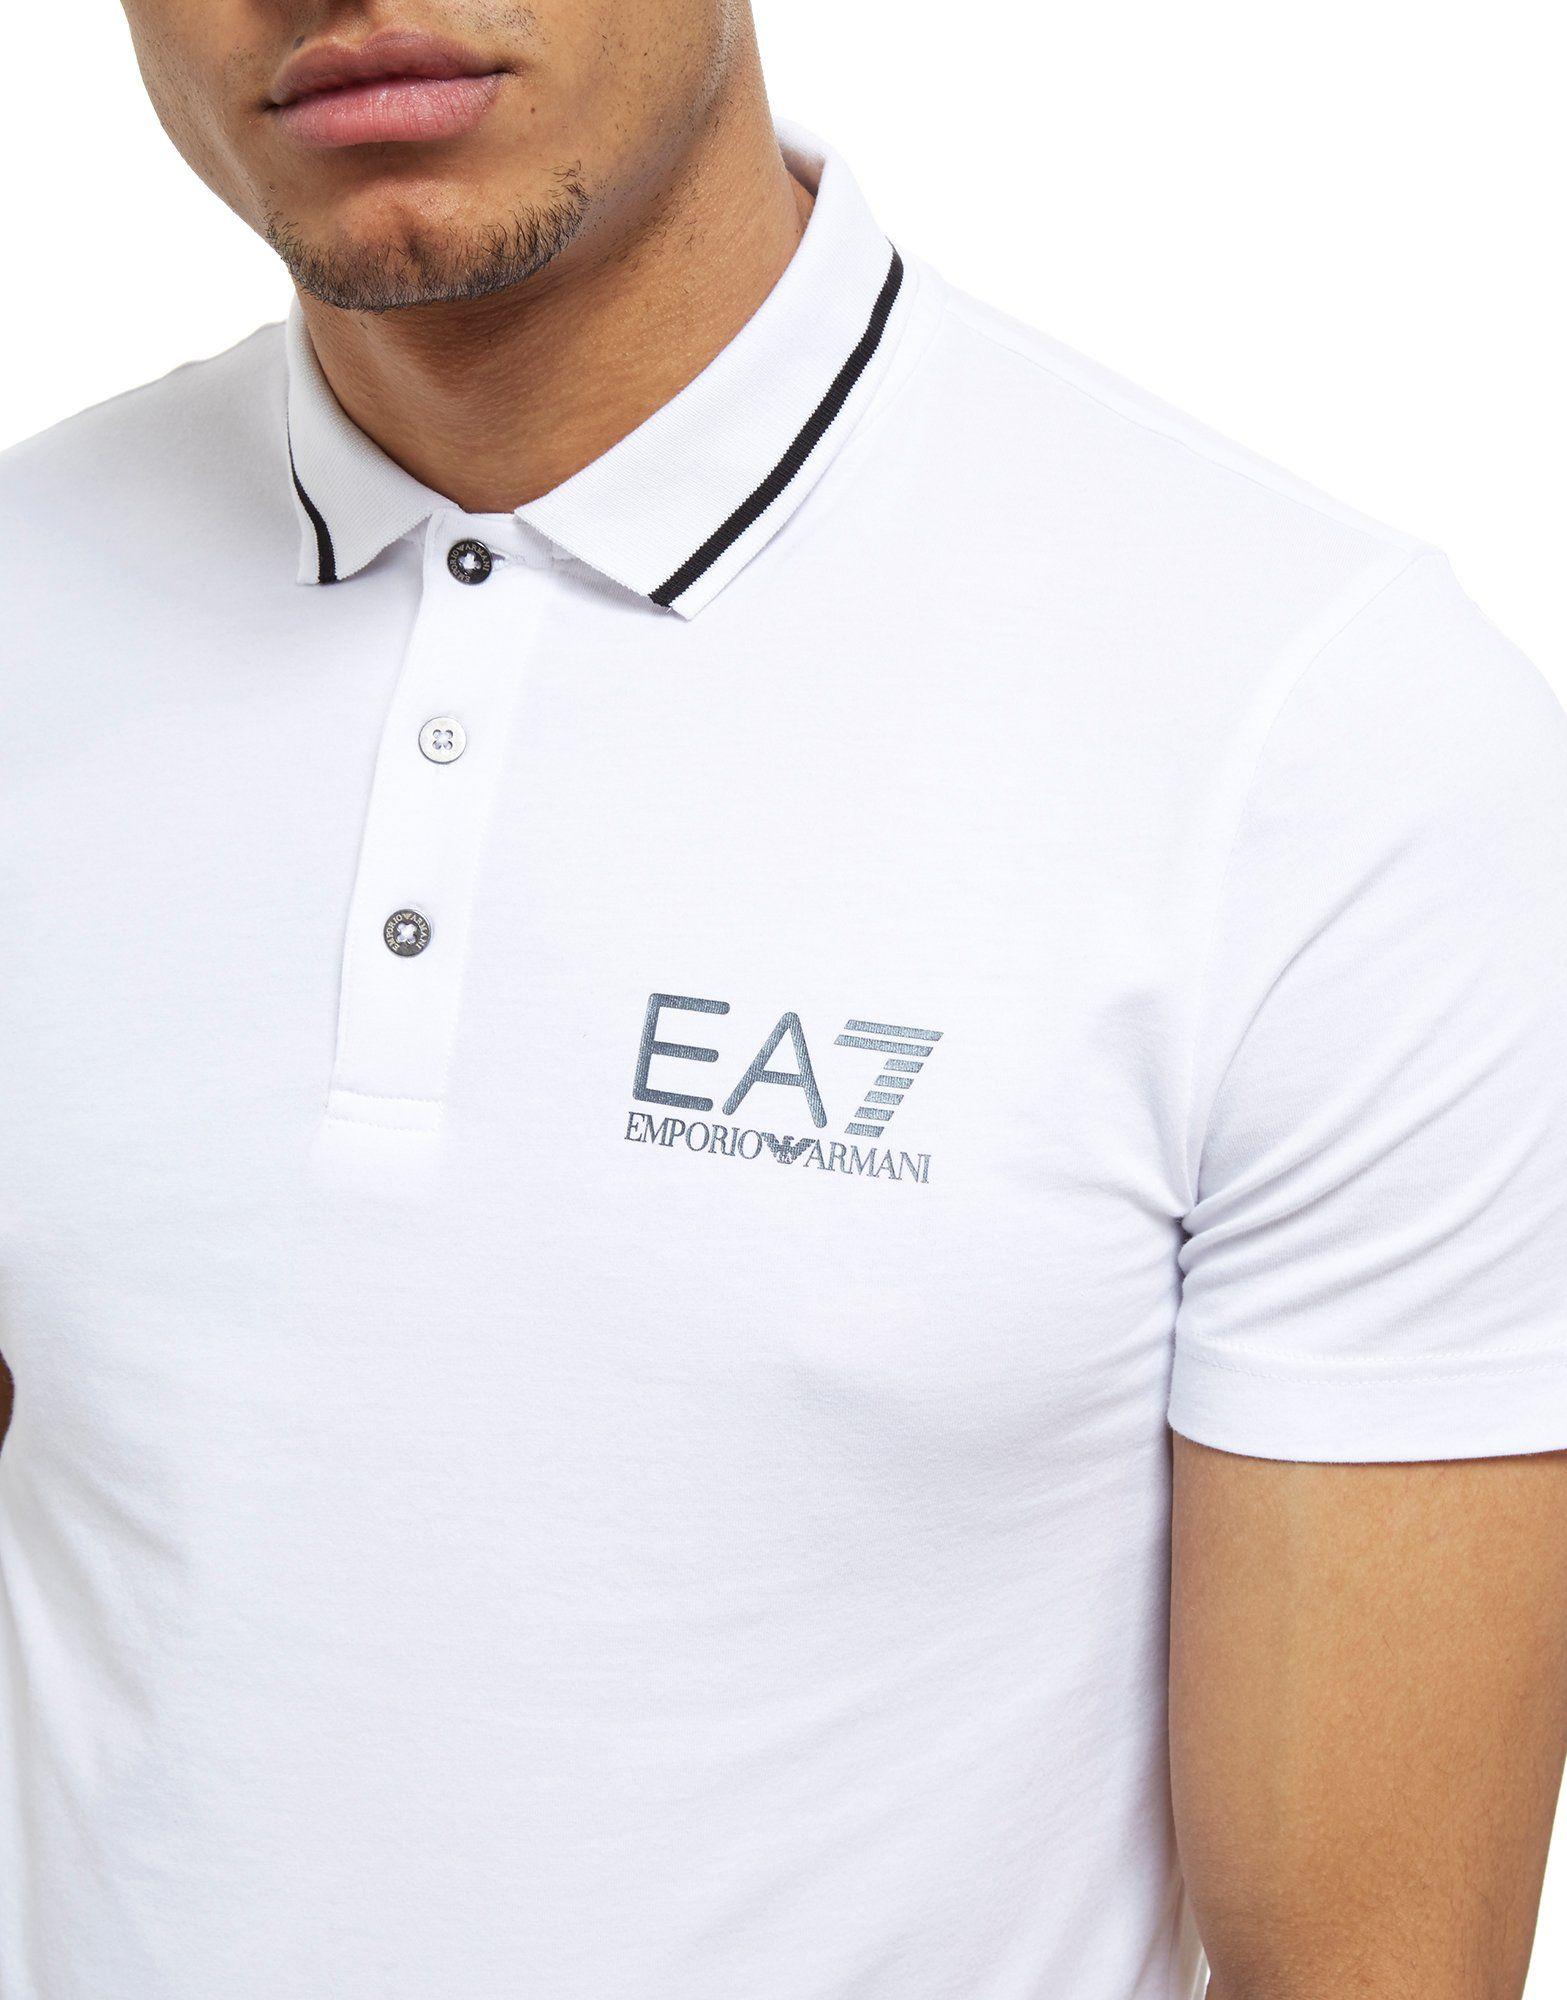 Emporio Armani EA7 Weiss Armani Shirt Polo Shirt Core Core Weiss Polo Emporio EA7 Armani Emporio HtYFwHq